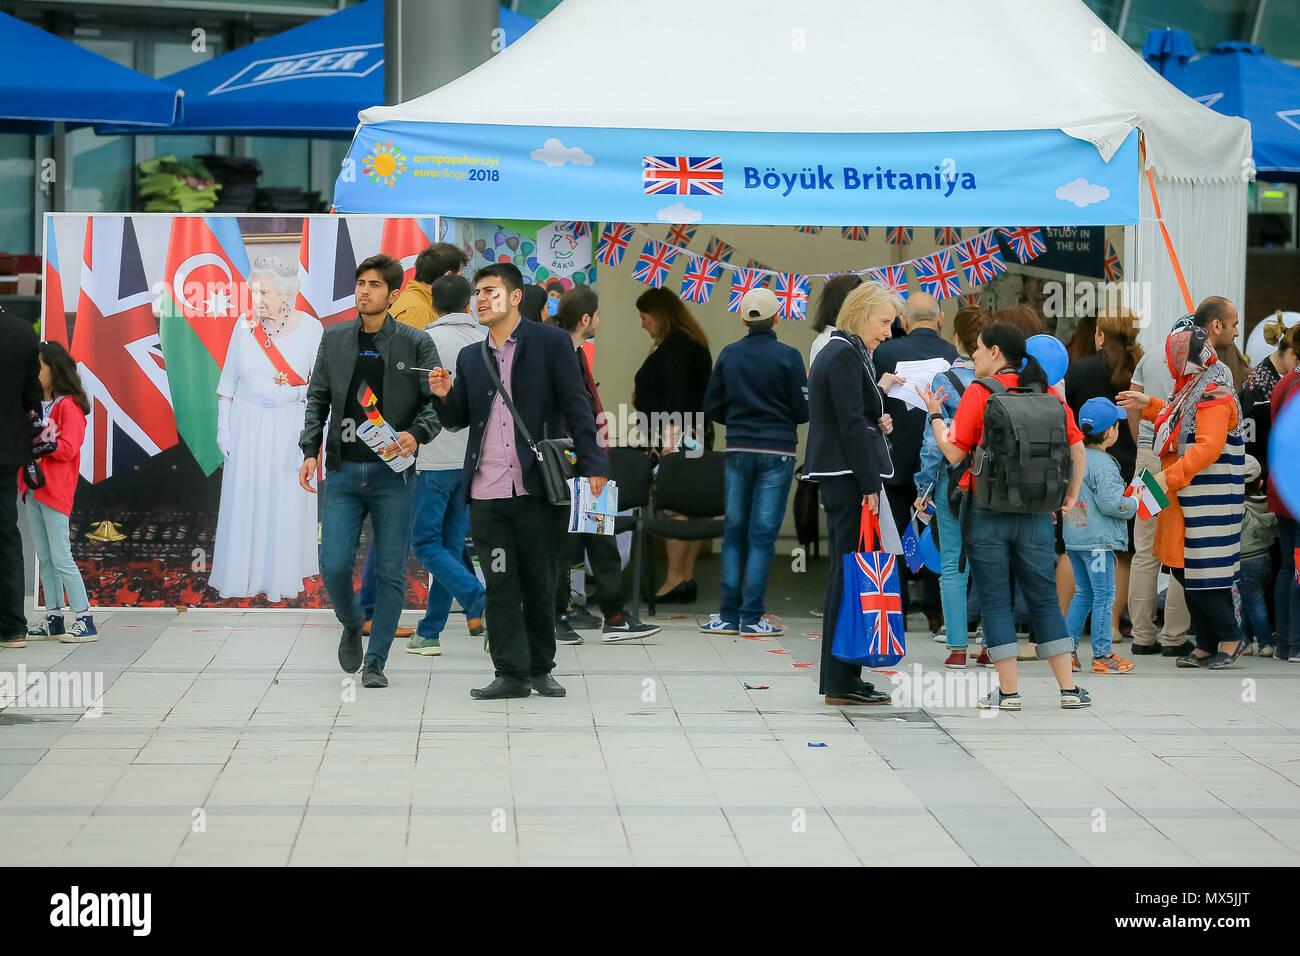 Azerbaijan  02nd June, 2018  Great Britain tents demonstrate their